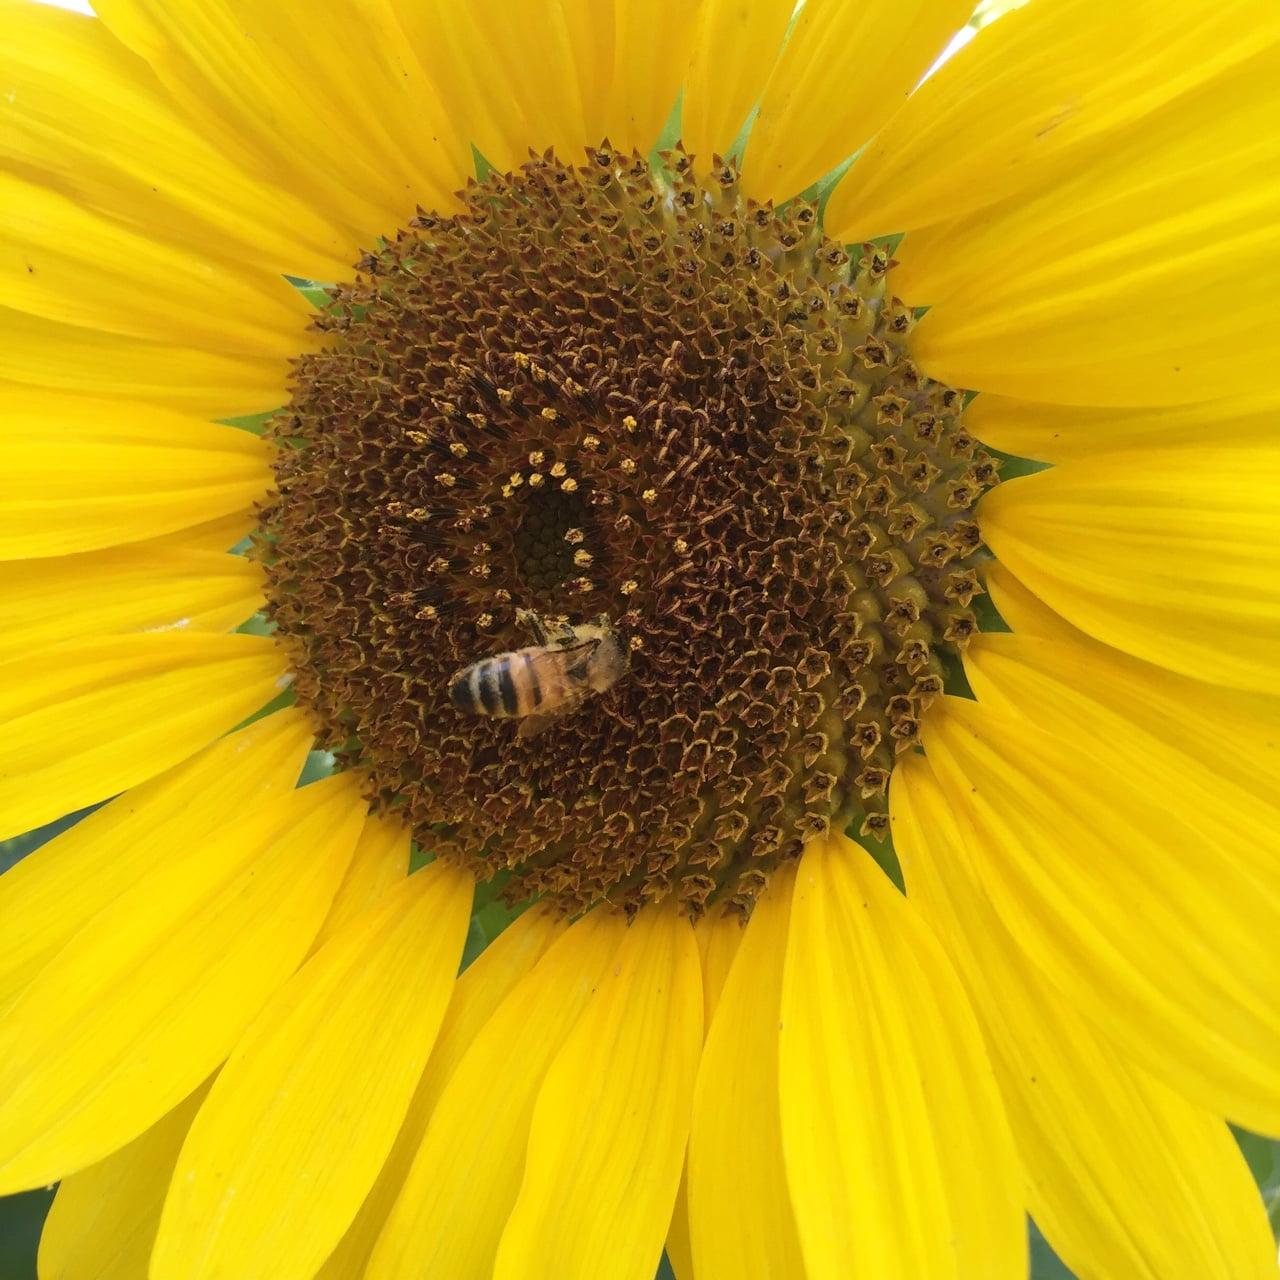 A busy pollinator